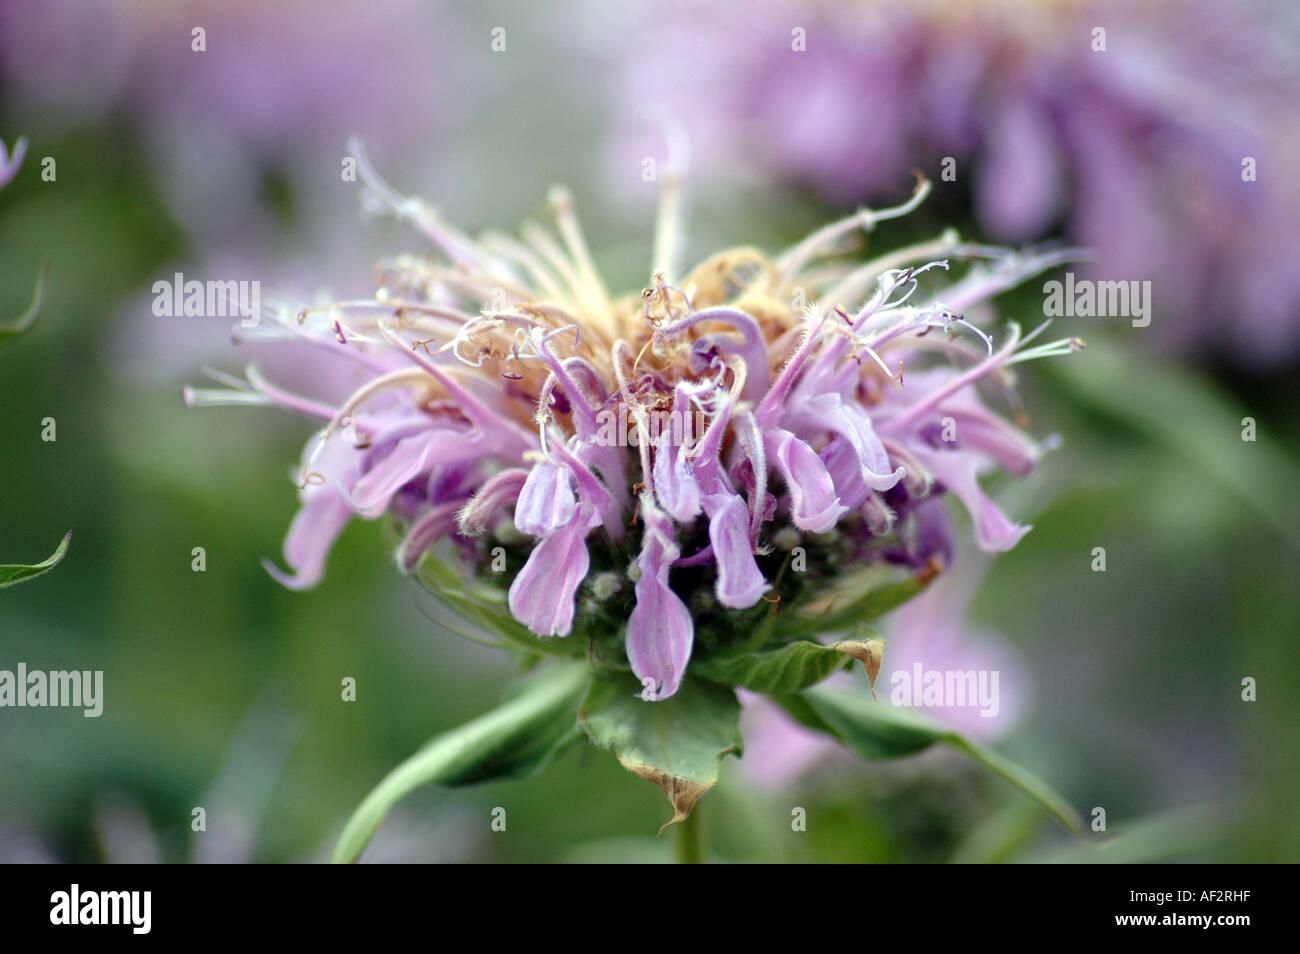 Scarlet Beebalm Monarda didyma also called Oswego Tea or Bergamot Stock Photo